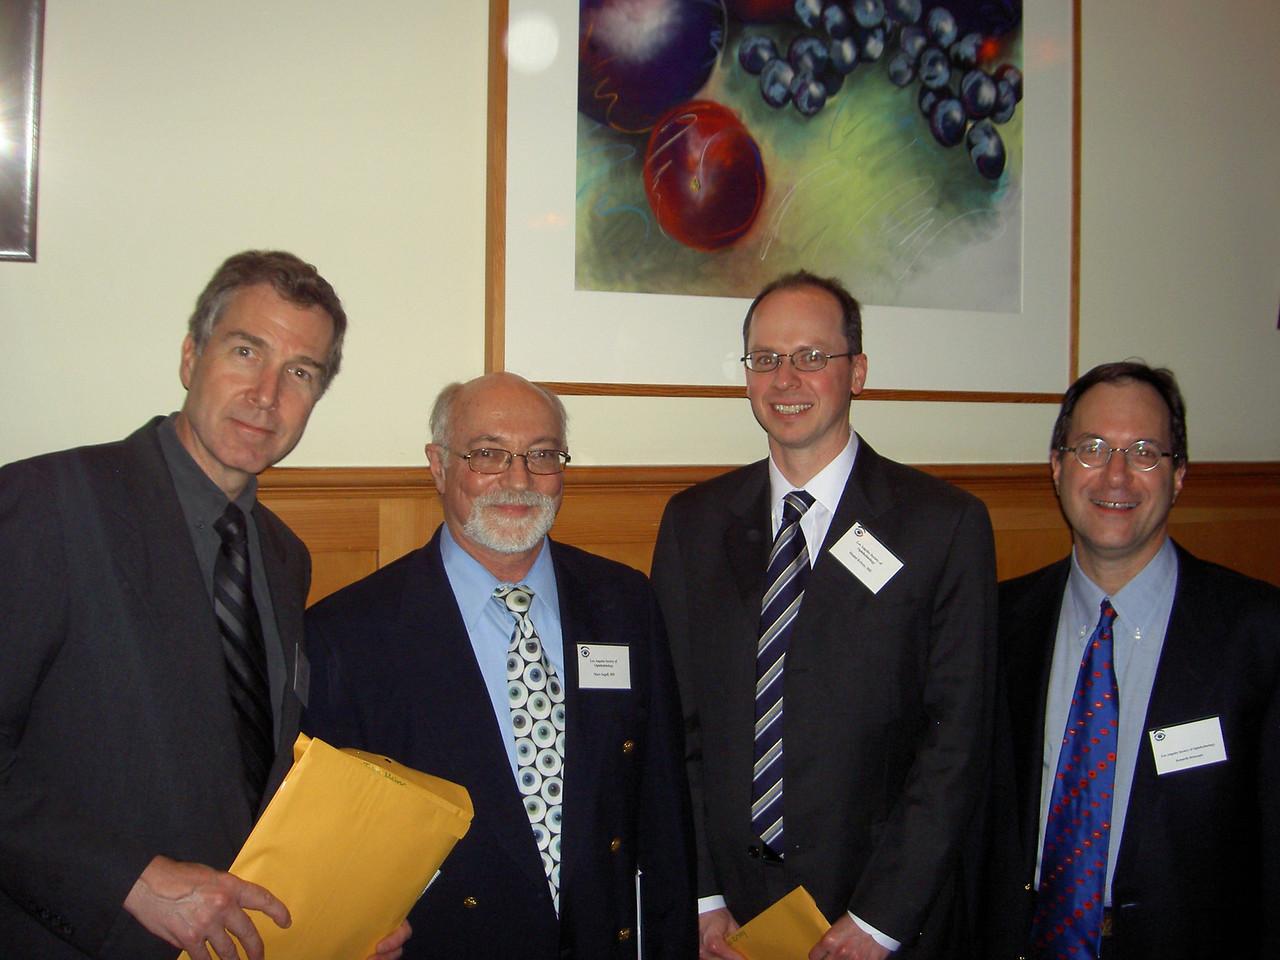 0405 John Maher, Marc Segall, Daniel Krivoy, Ken Steinsapir